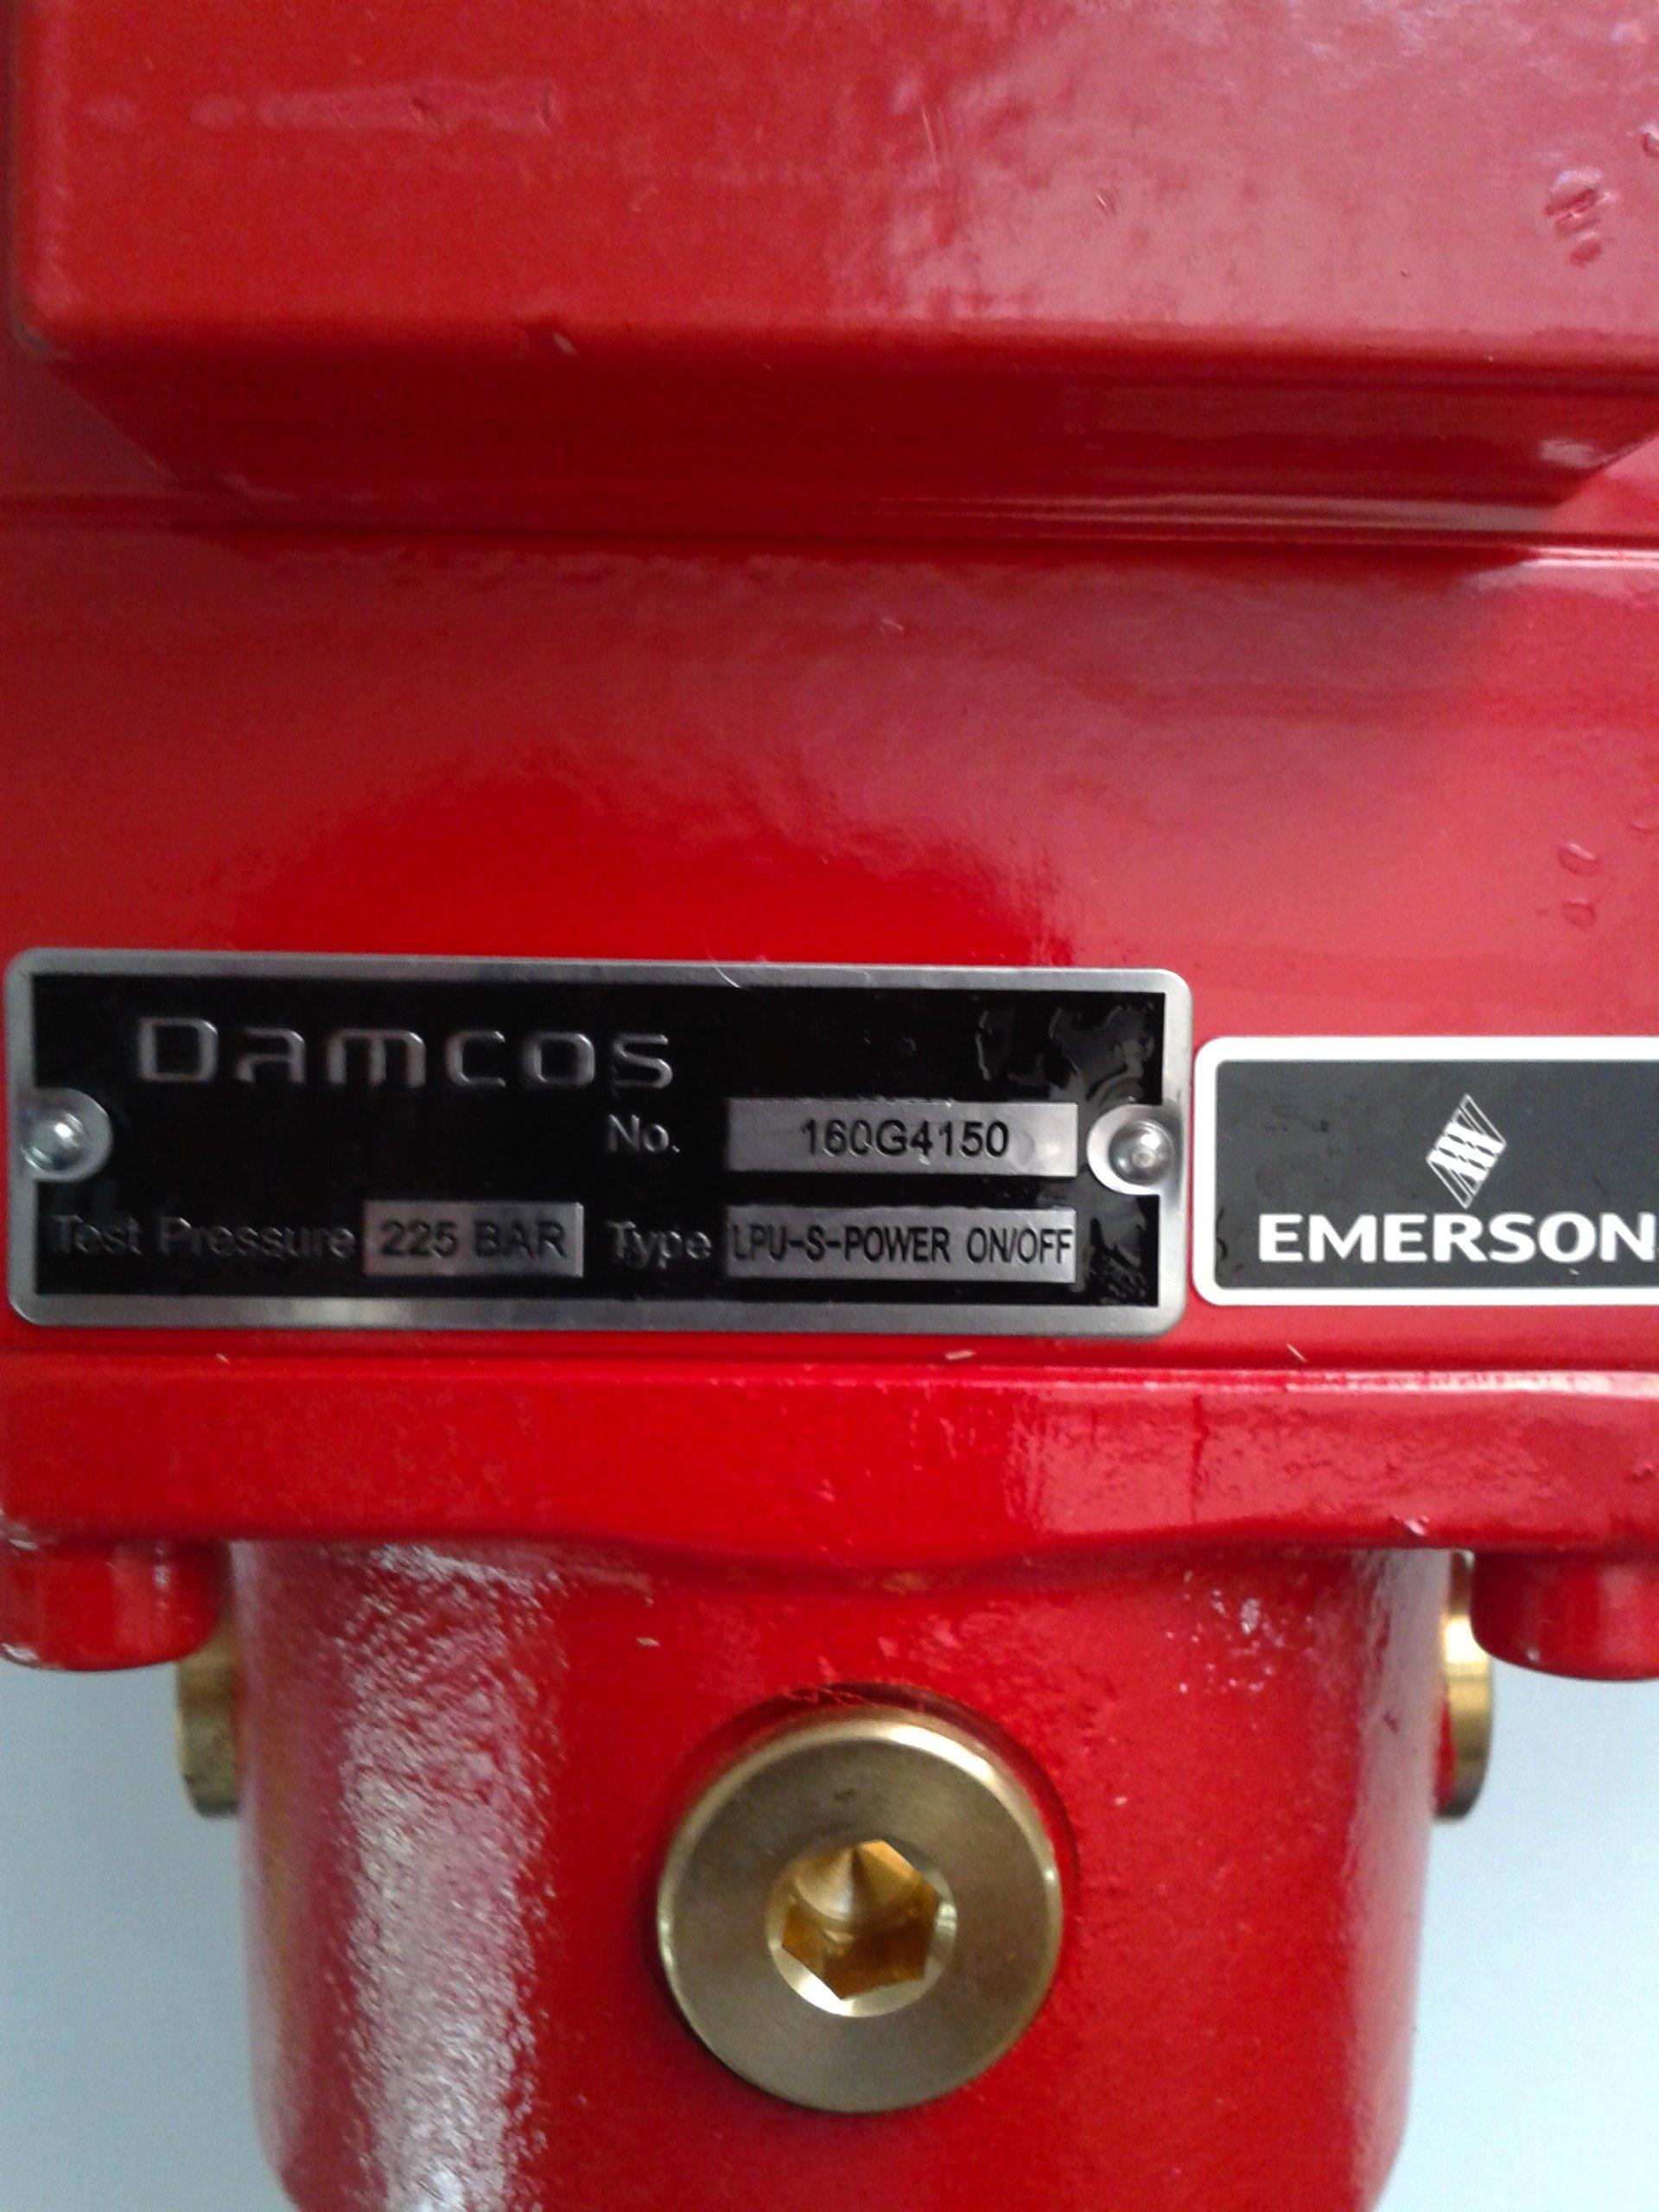 Damcos 160G4150 LPU-S PIC1